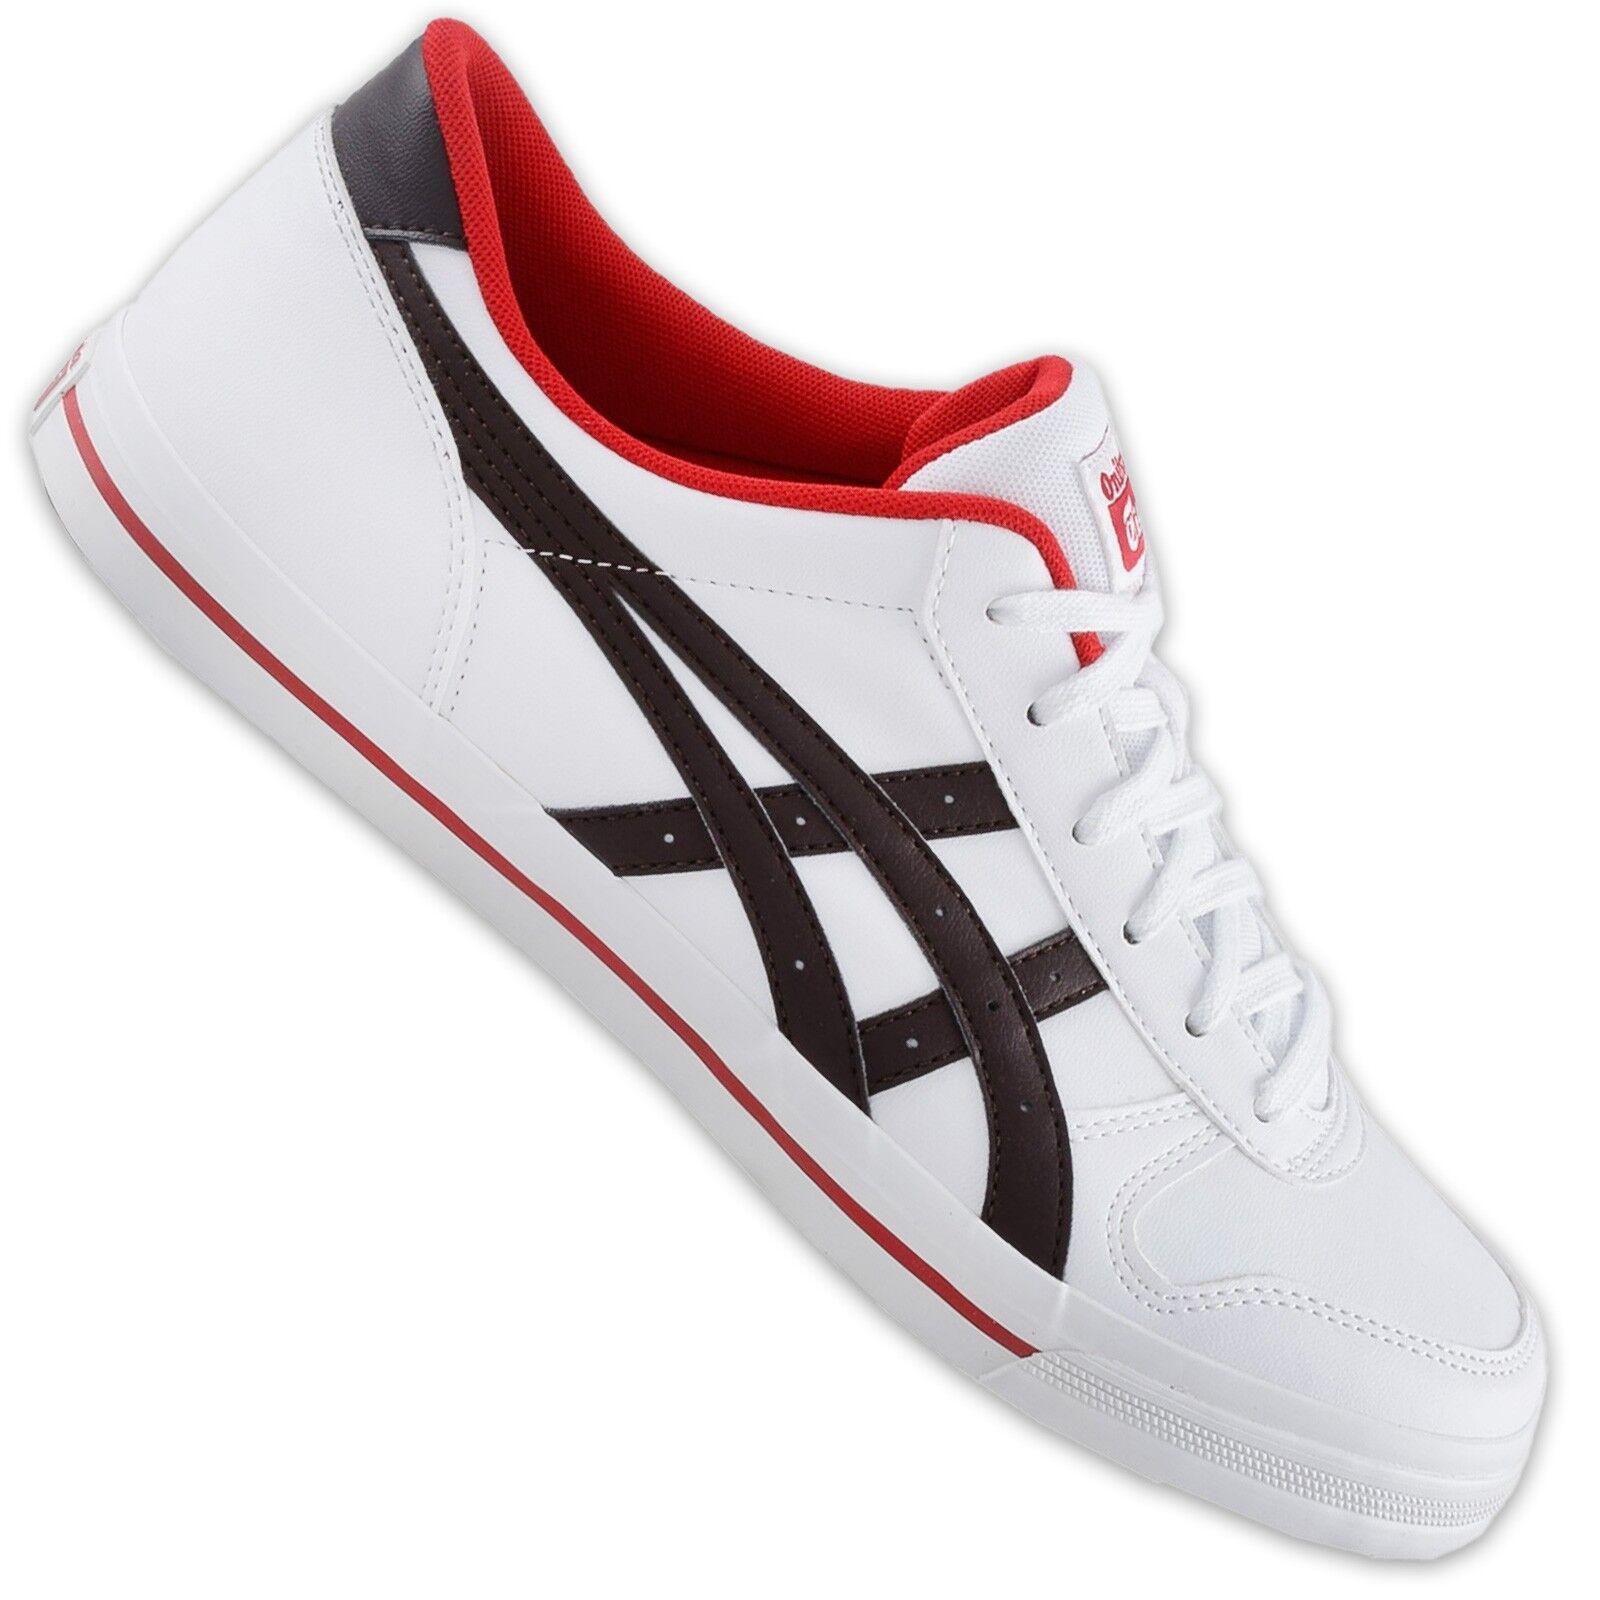 Asics Onitsuka Tiger aaron señora zapatos freizeitsneaker Weiss marrón rojo 38 39